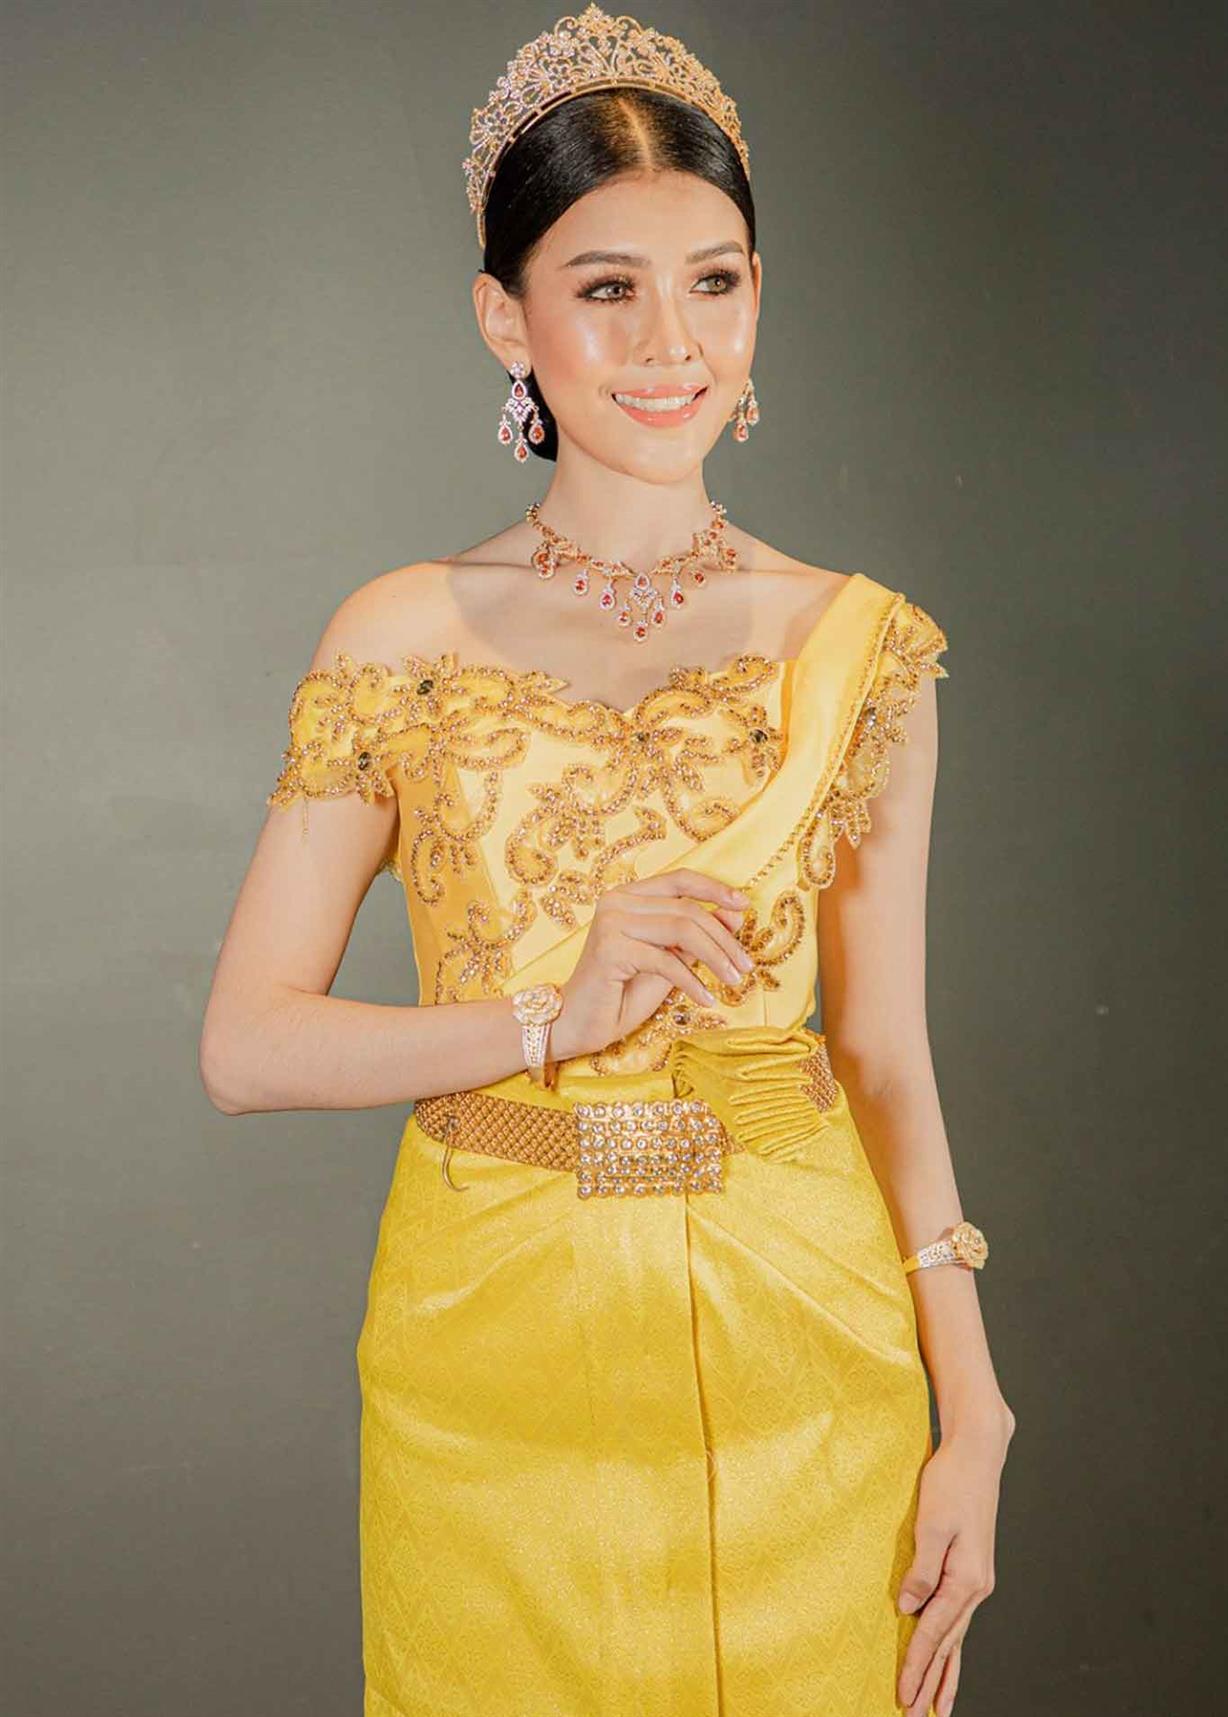 Miss Grand Takeo 2020 Savoun Kanha